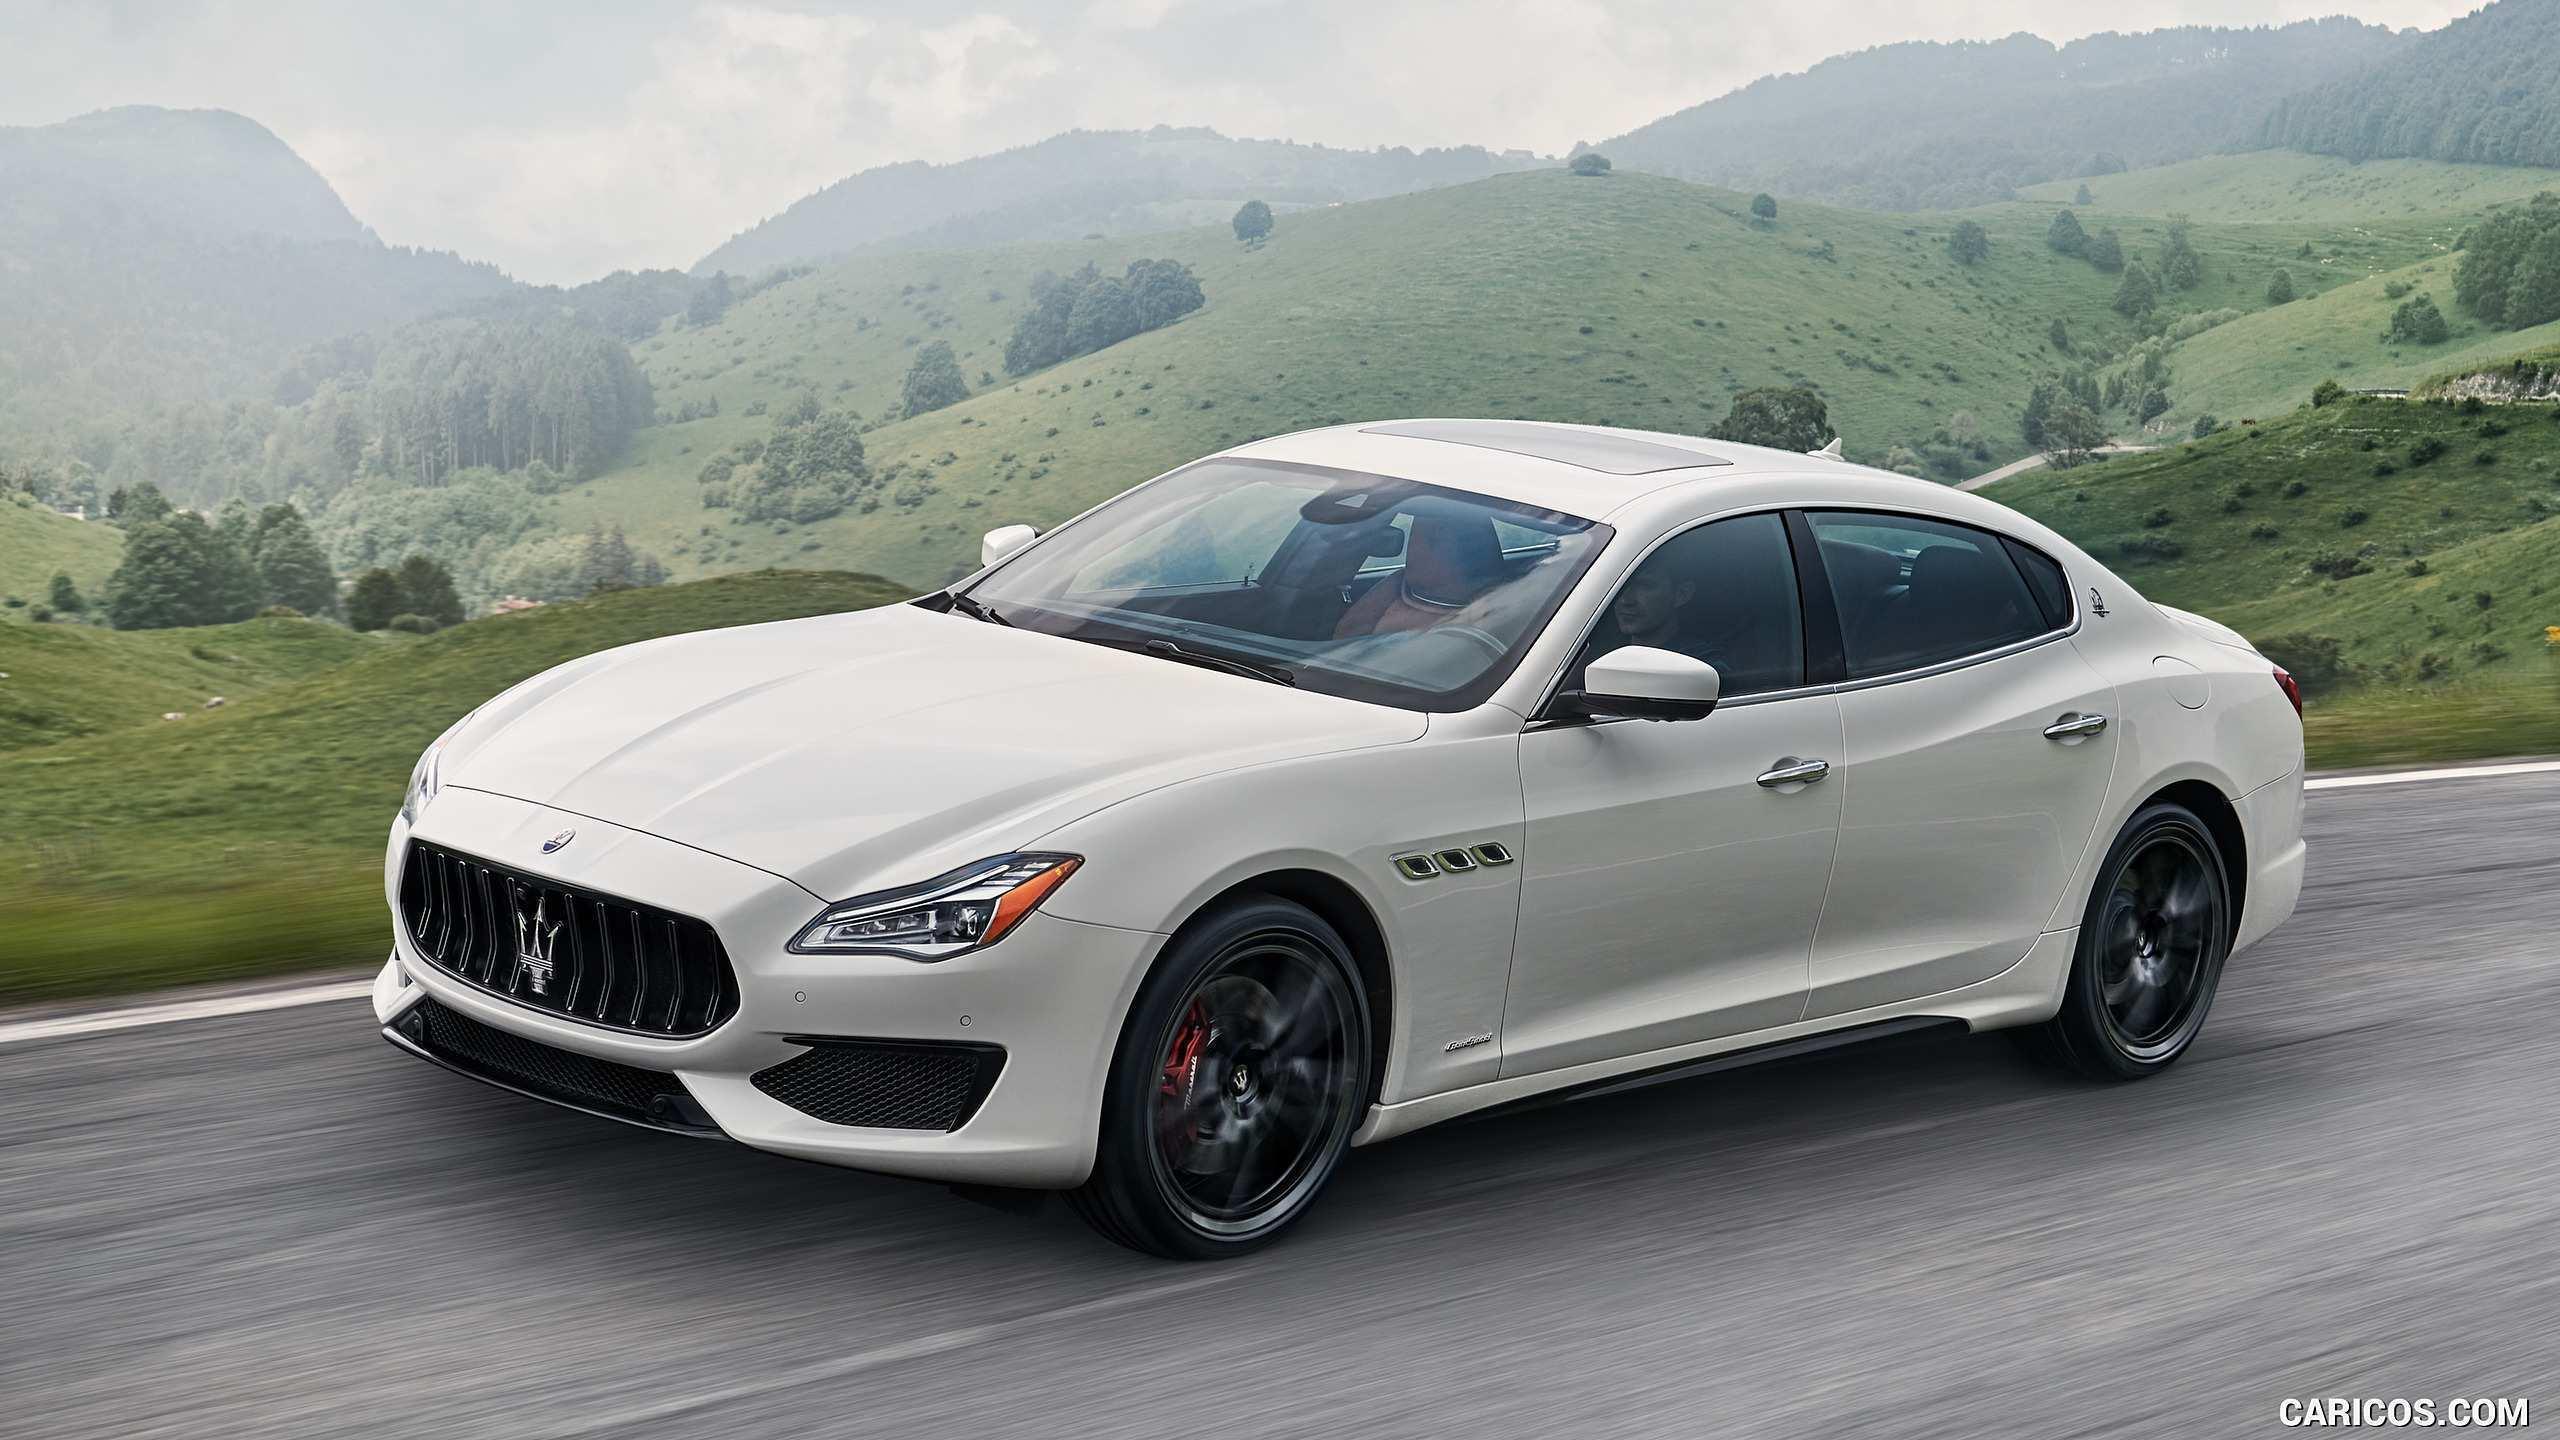 81 Great Maserati Quattroporte Gts 2019 Release Date by Maserati Quattroporte Gts 2019